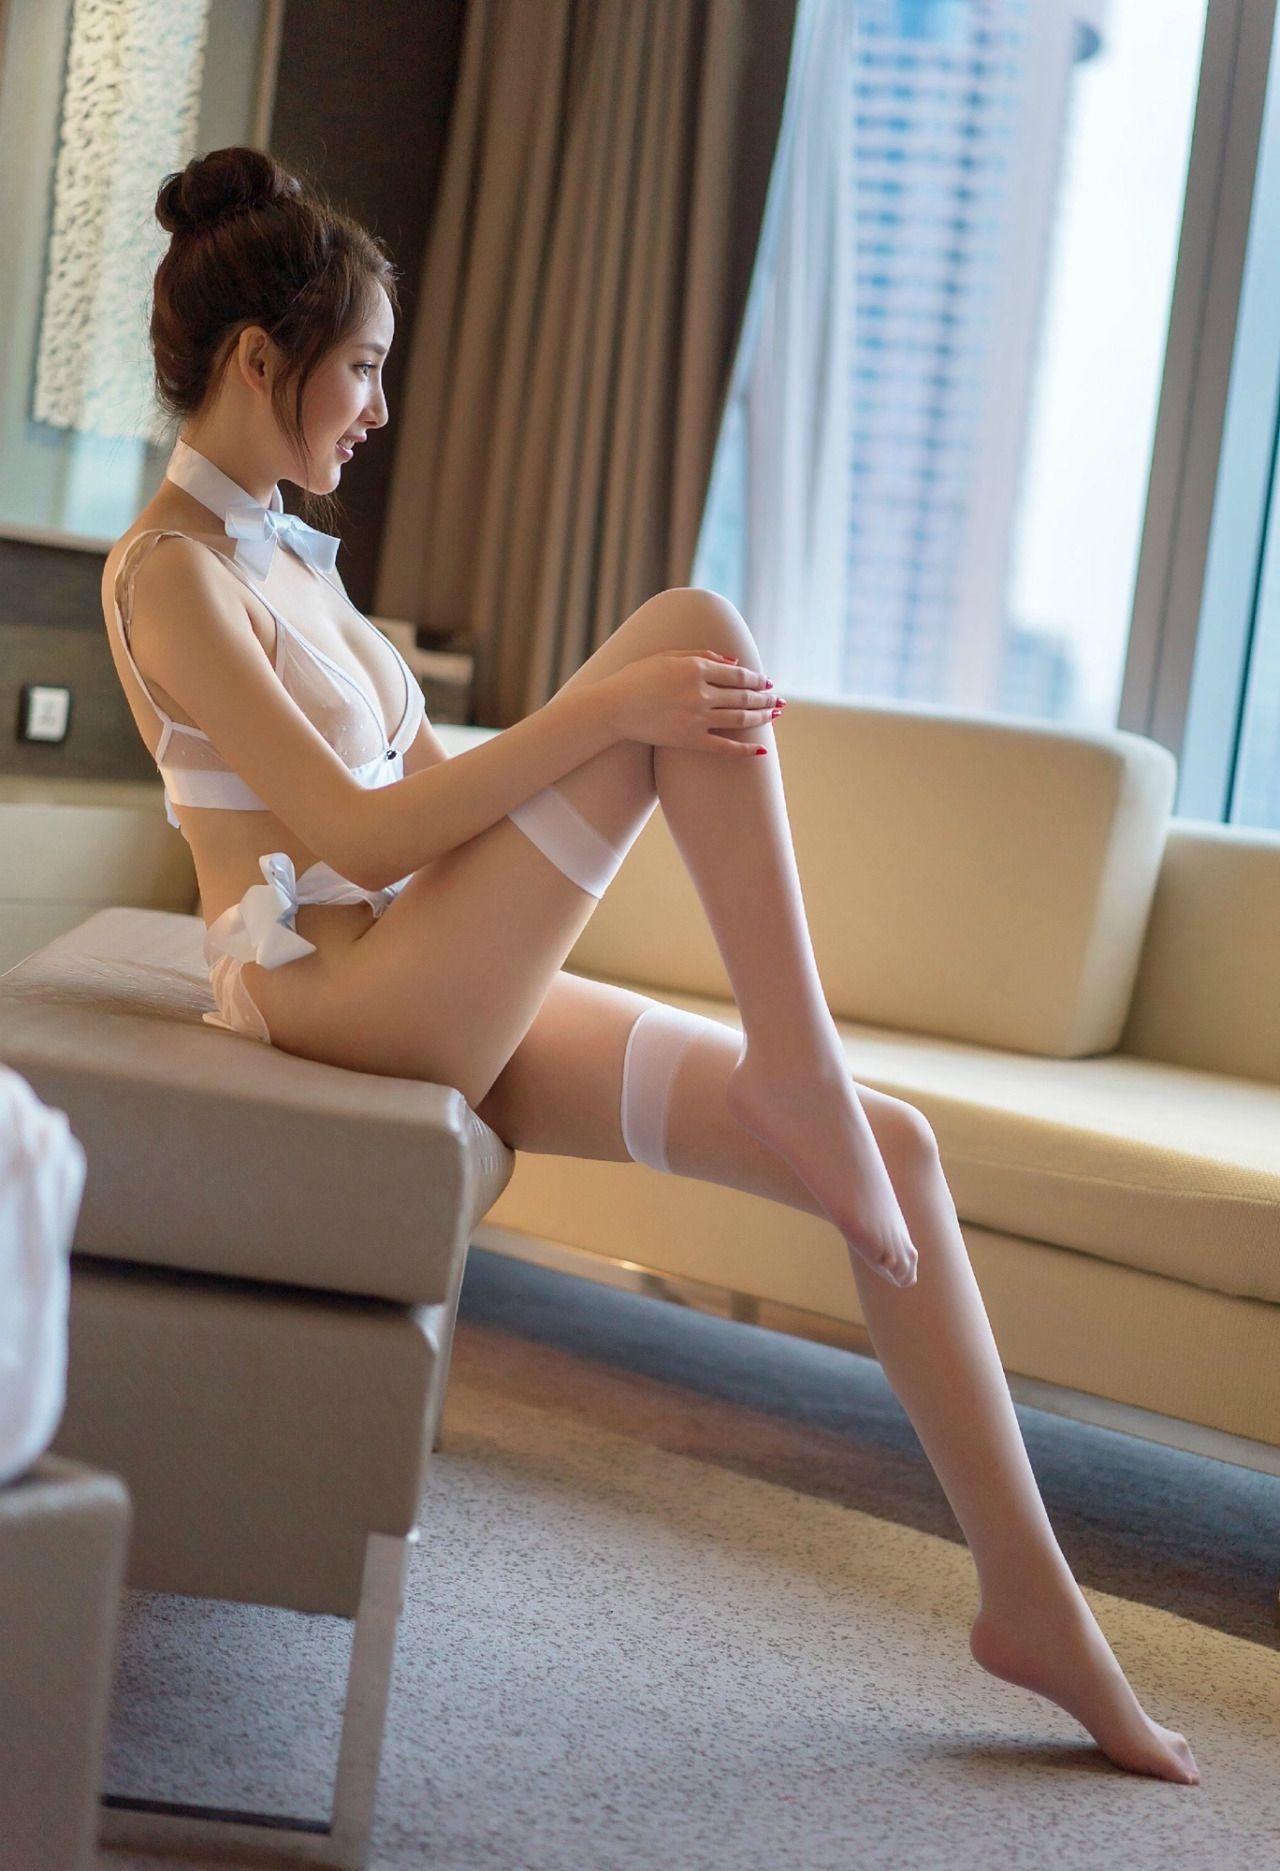 Asian Sissy Tumblr